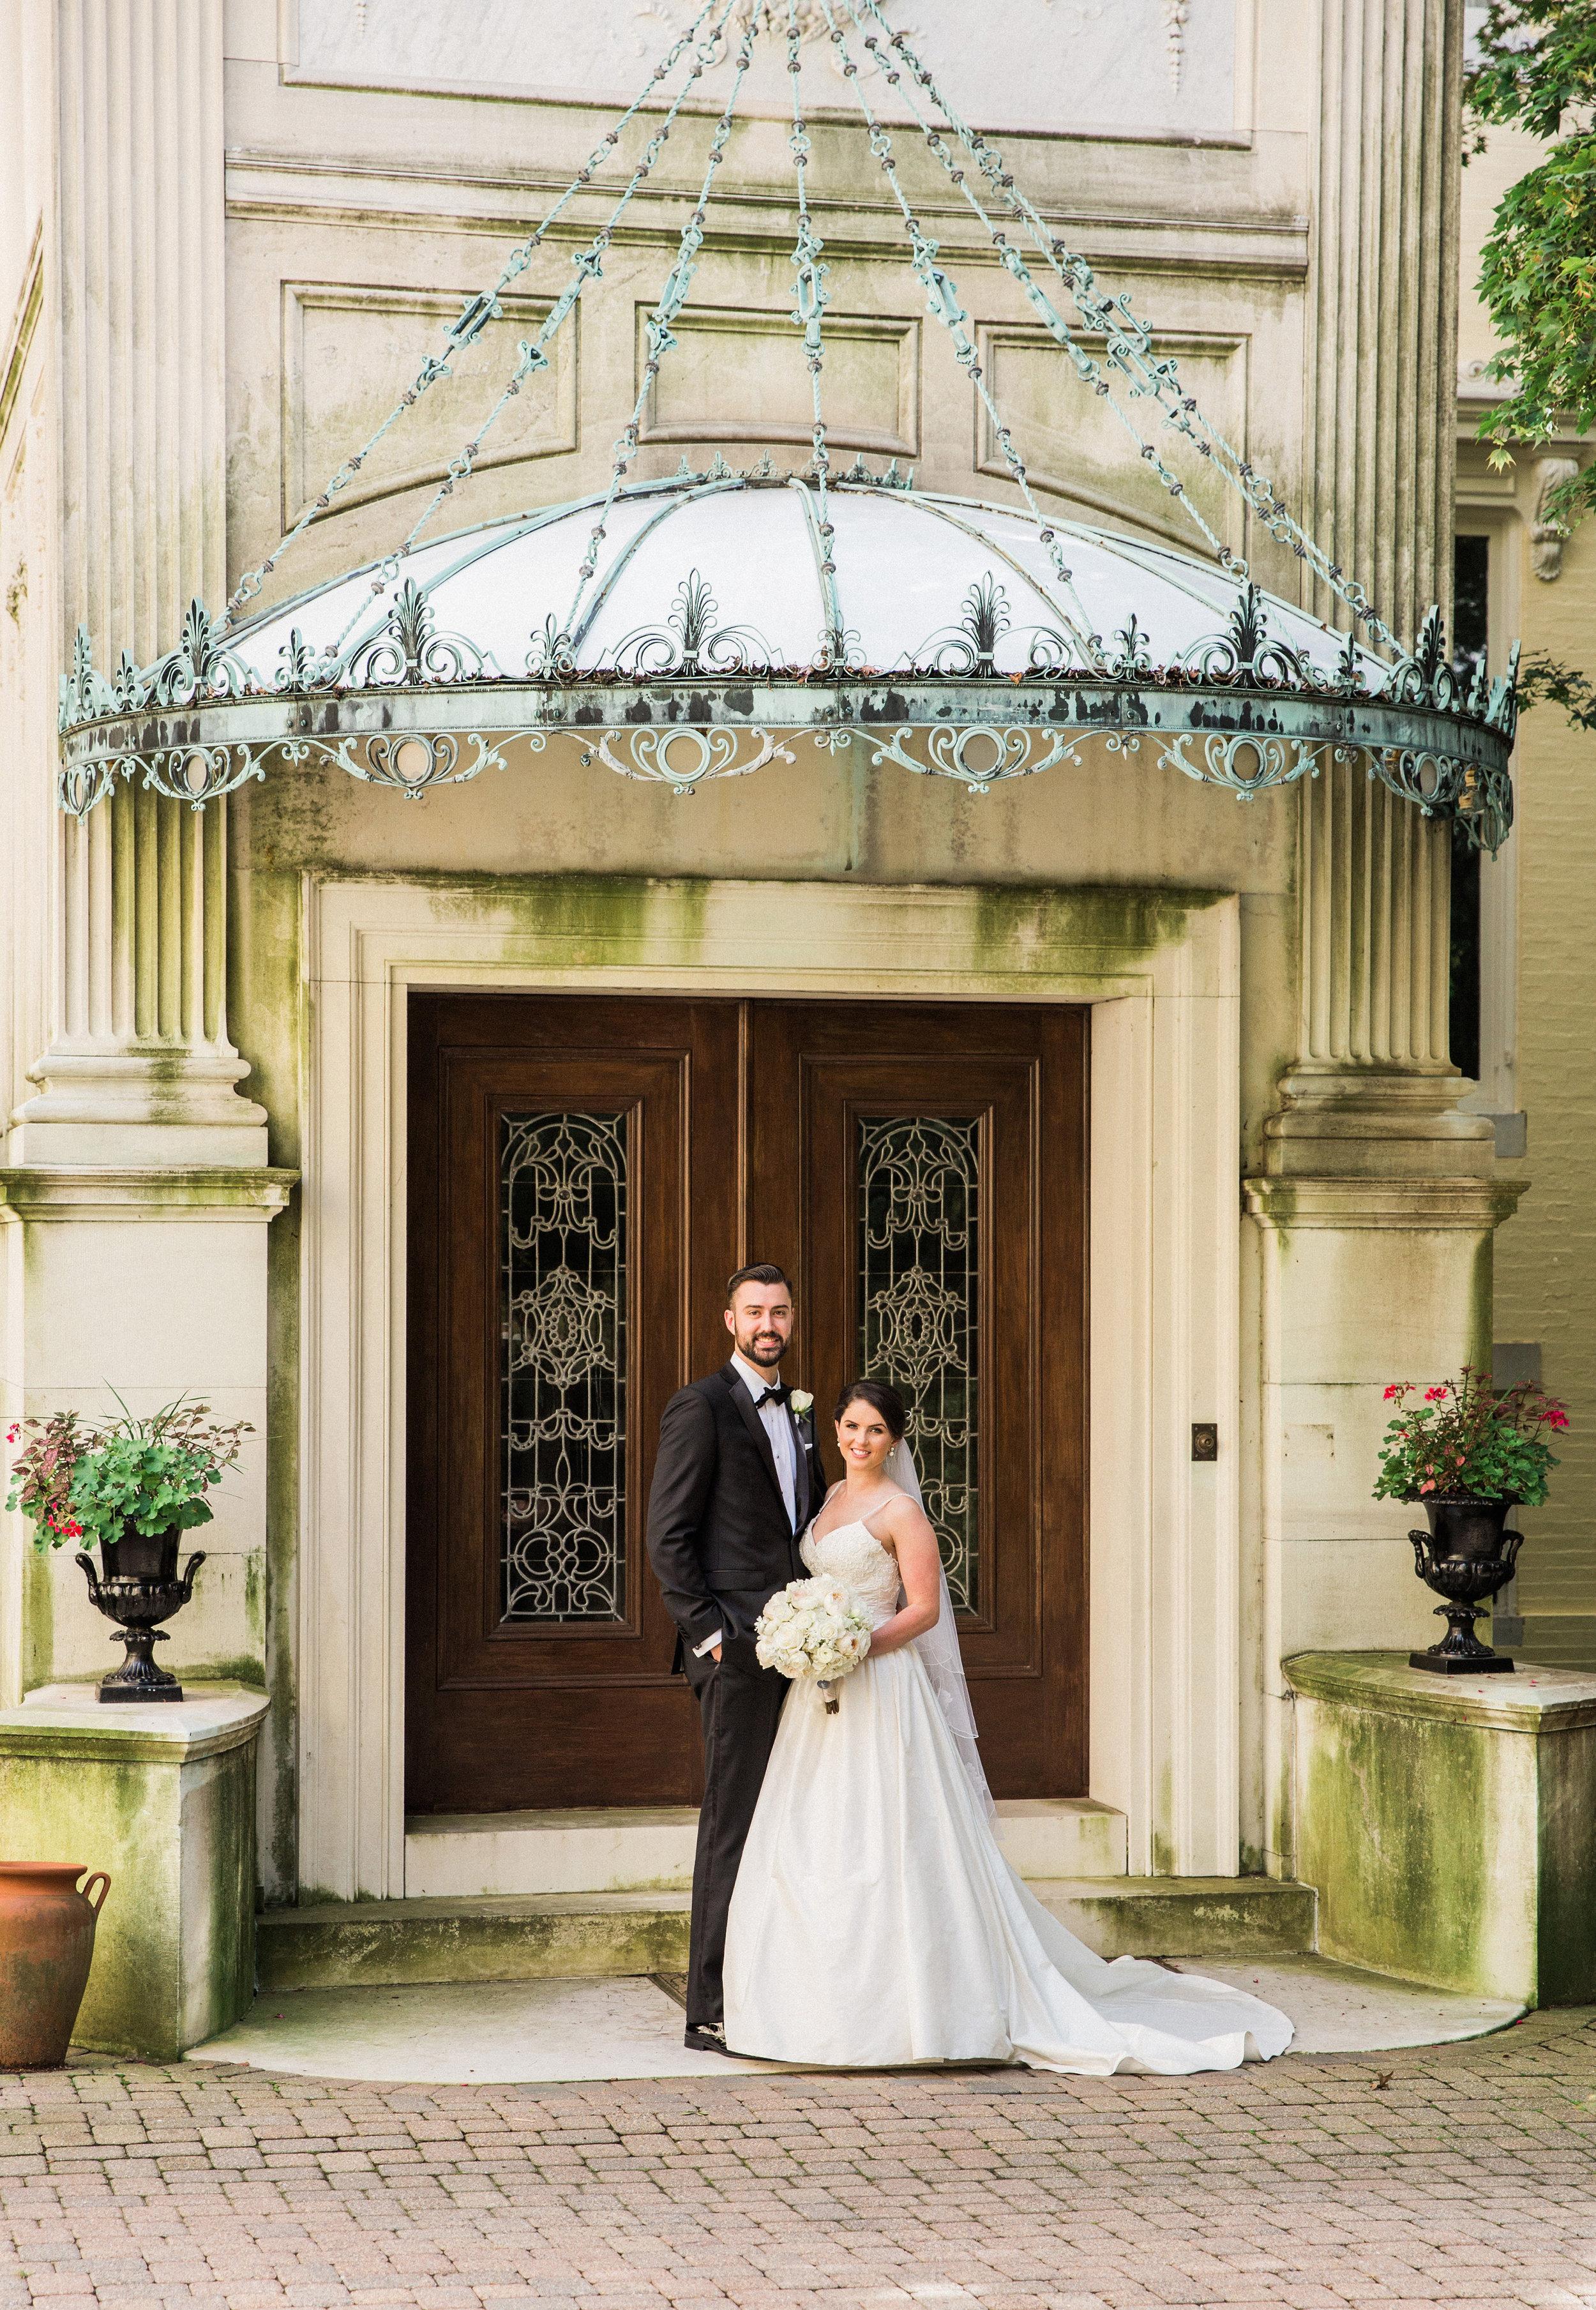 Evergreen-Museum-Balitmore-Maryland-Wedding-Black-Tie-Bride-001.jpg